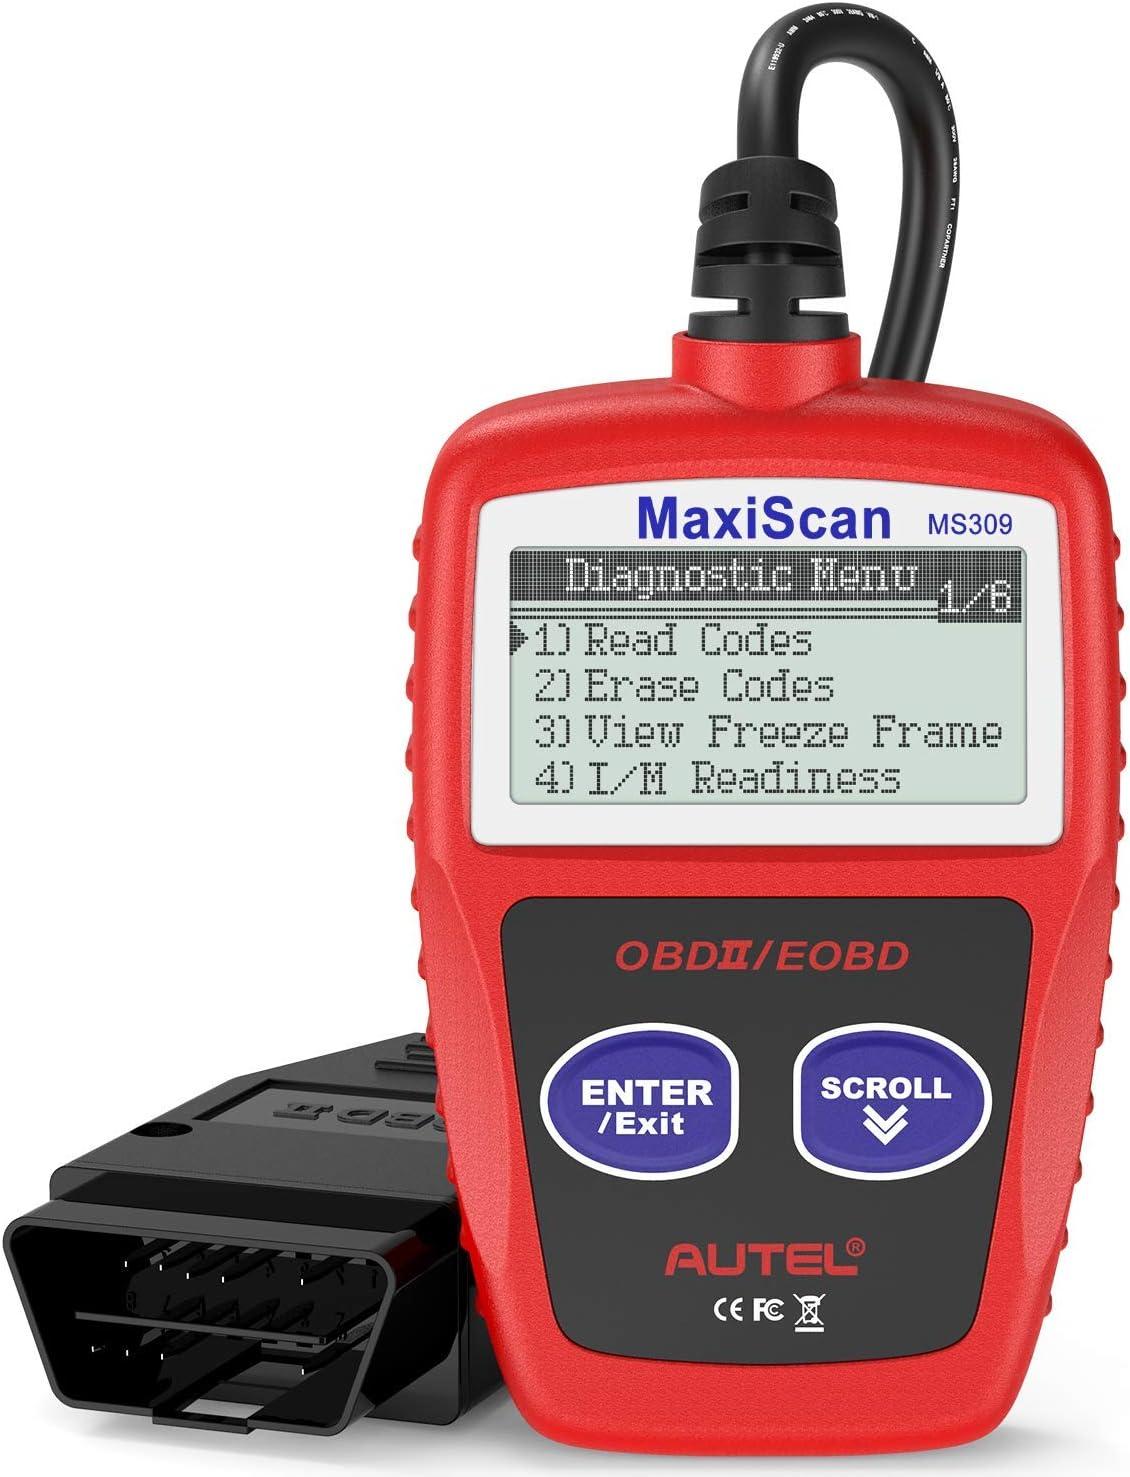 Autel MS309 Universal OBD2 Scanner for vw